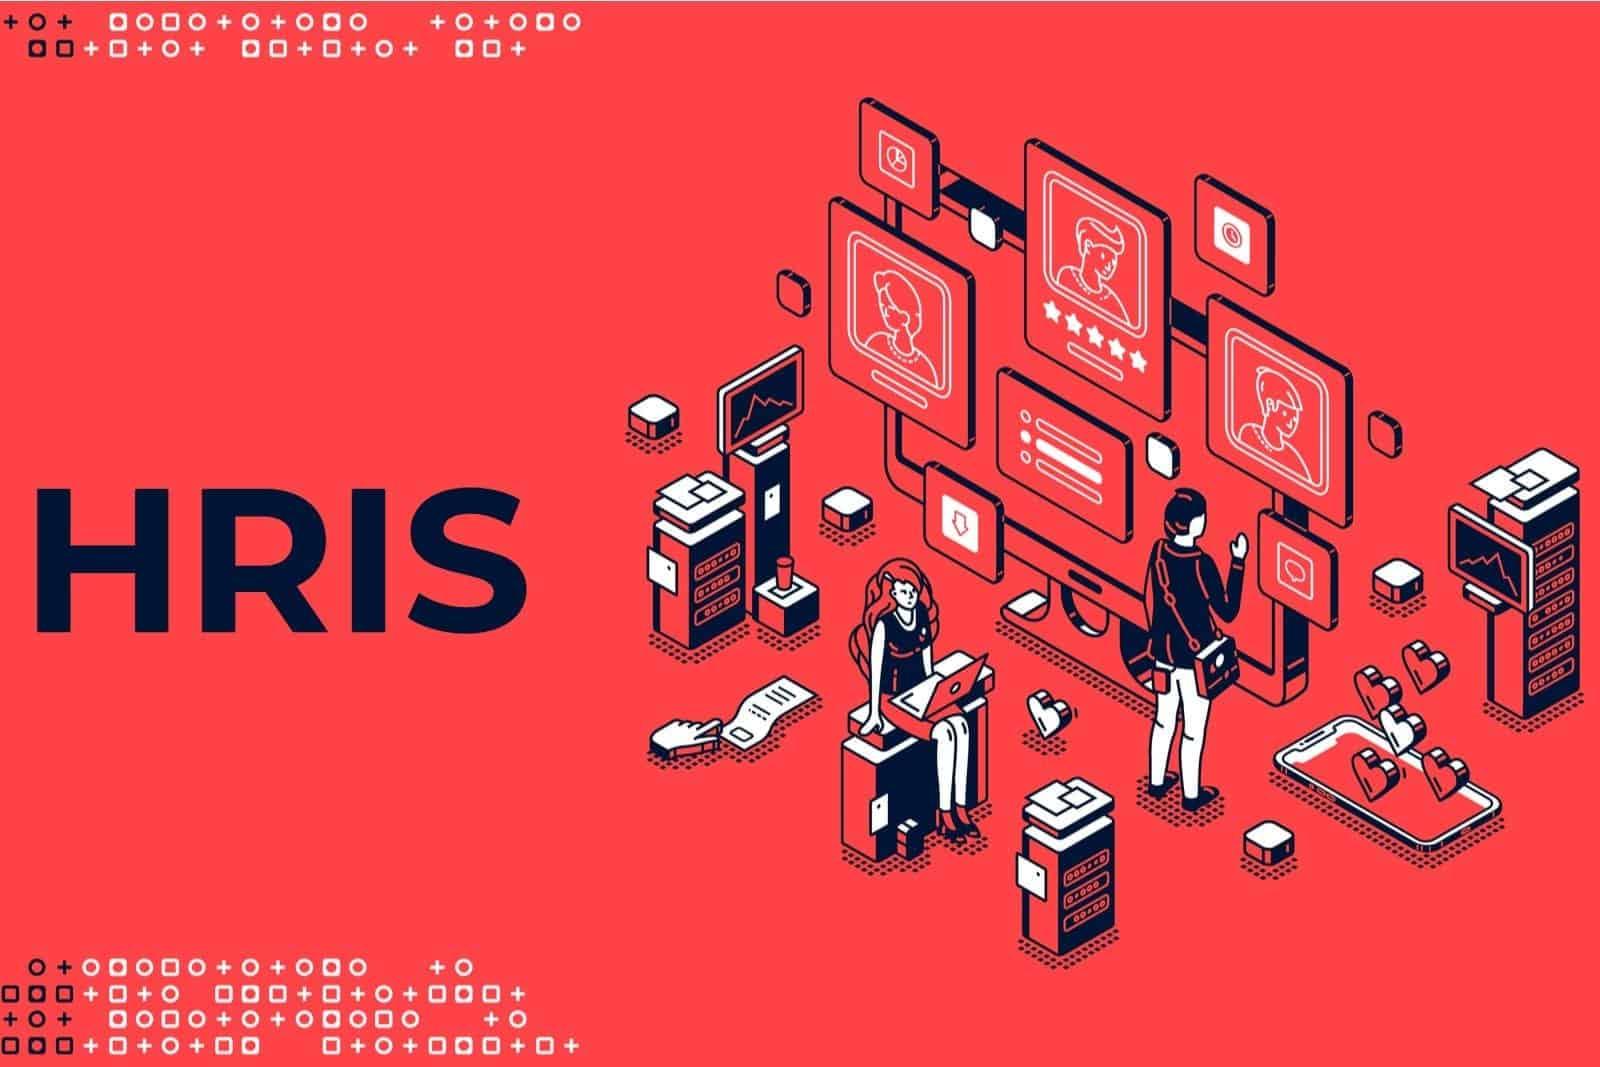 Fitur Unggulan Software HRIS dan Manfaatnya bagi Perusahaan